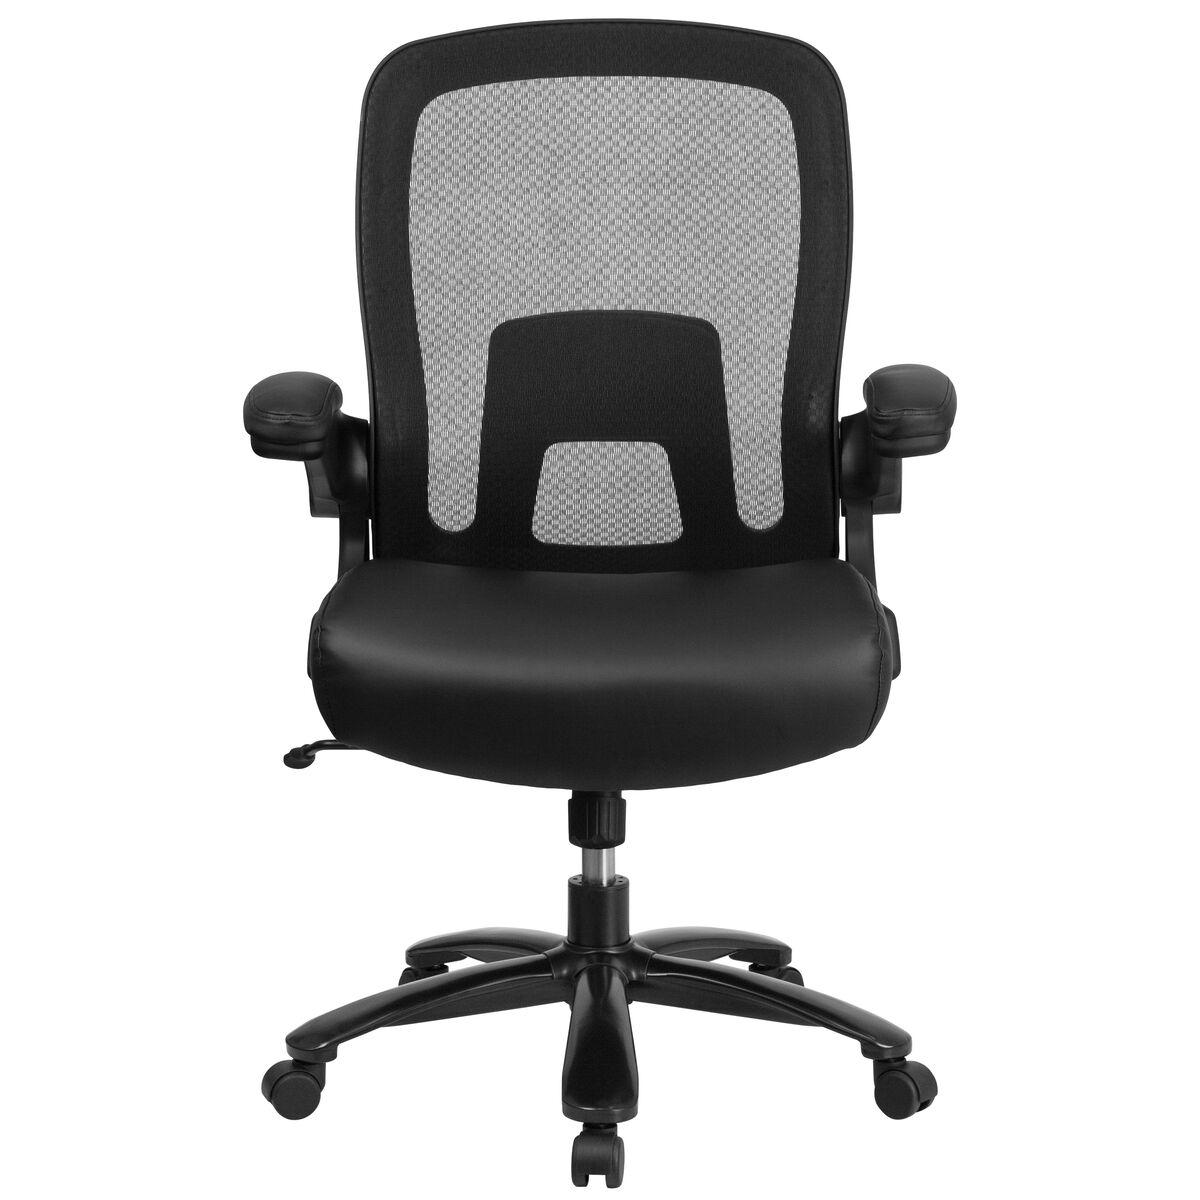 black 500lb high back chair bt 20180 lea gg churchchairs4less com